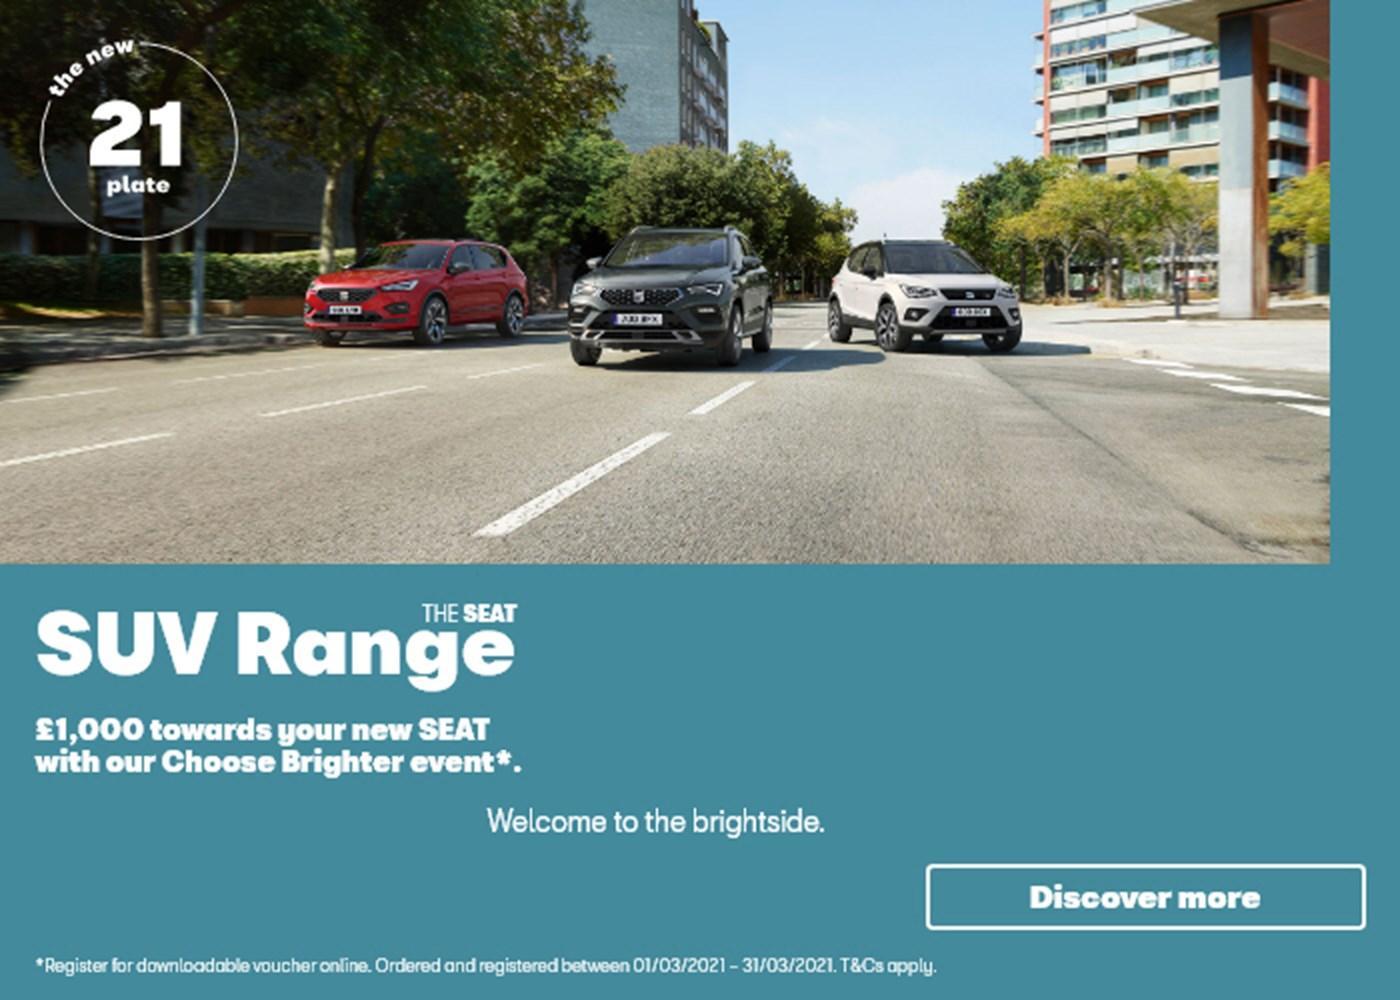 SEAT SUV Range Event Offer